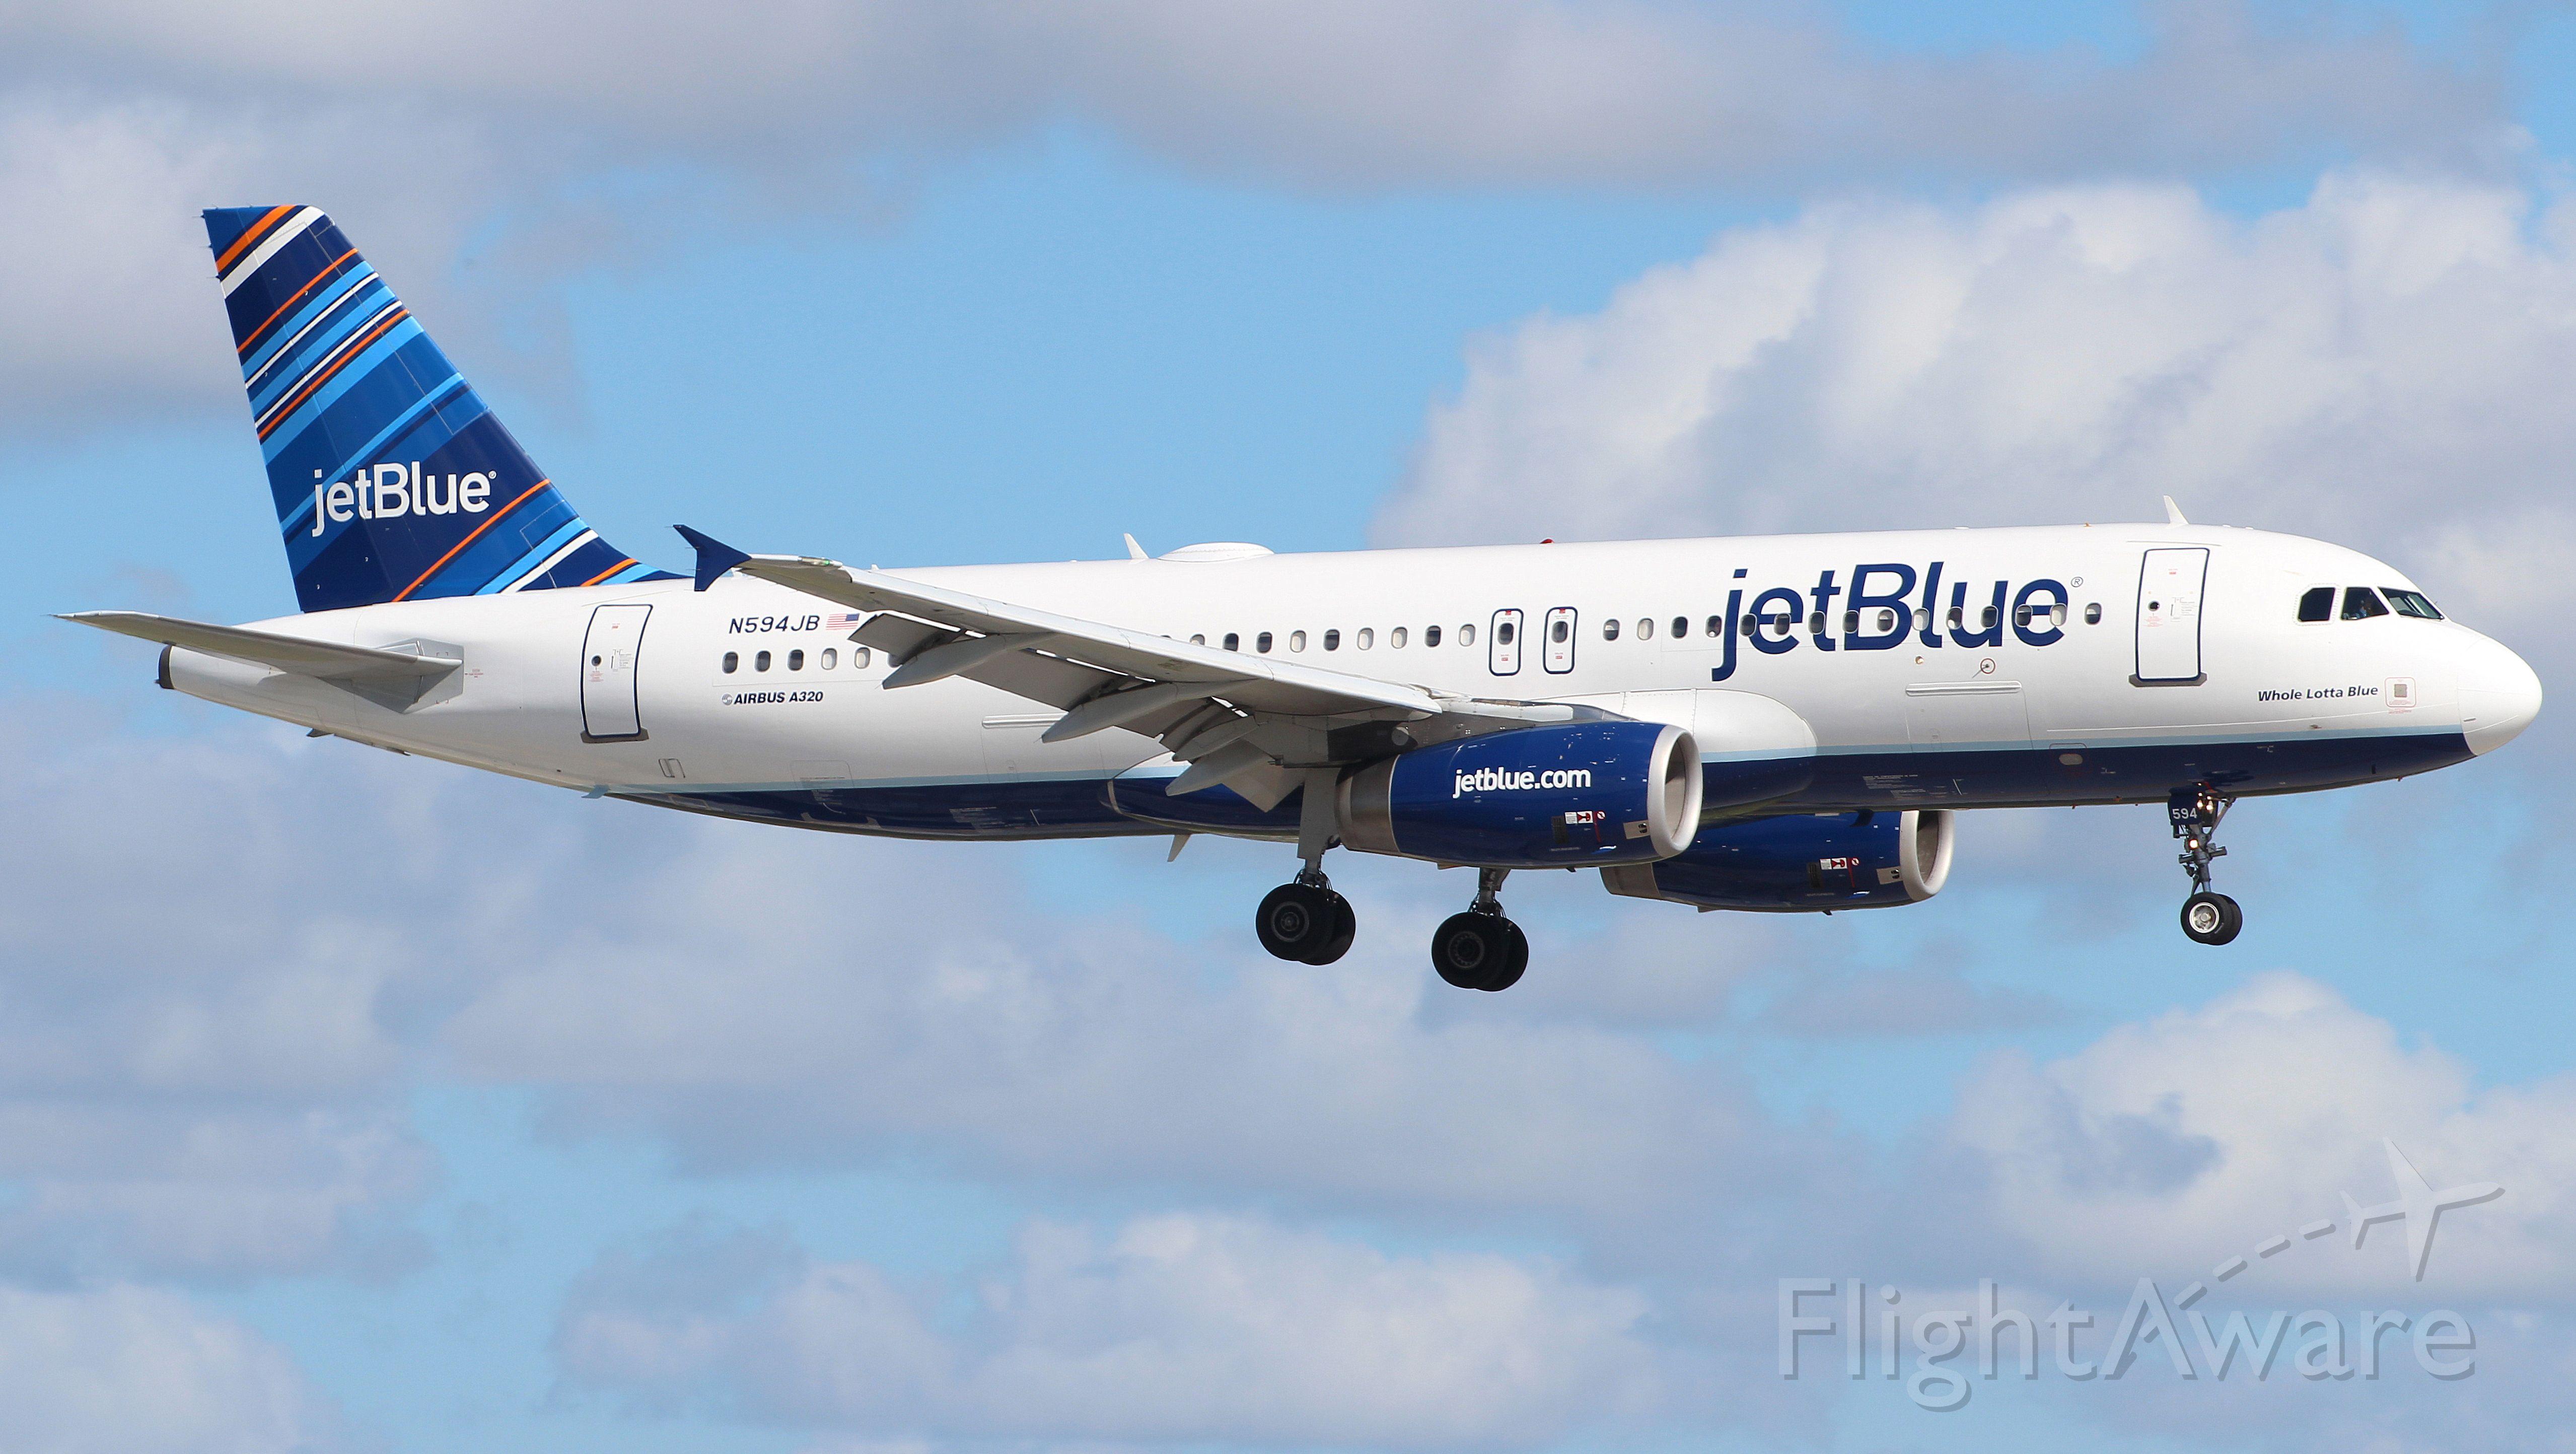 Airbus A320 (N594JB) - 06.10.2013 Landing at Fort Lauderdale International